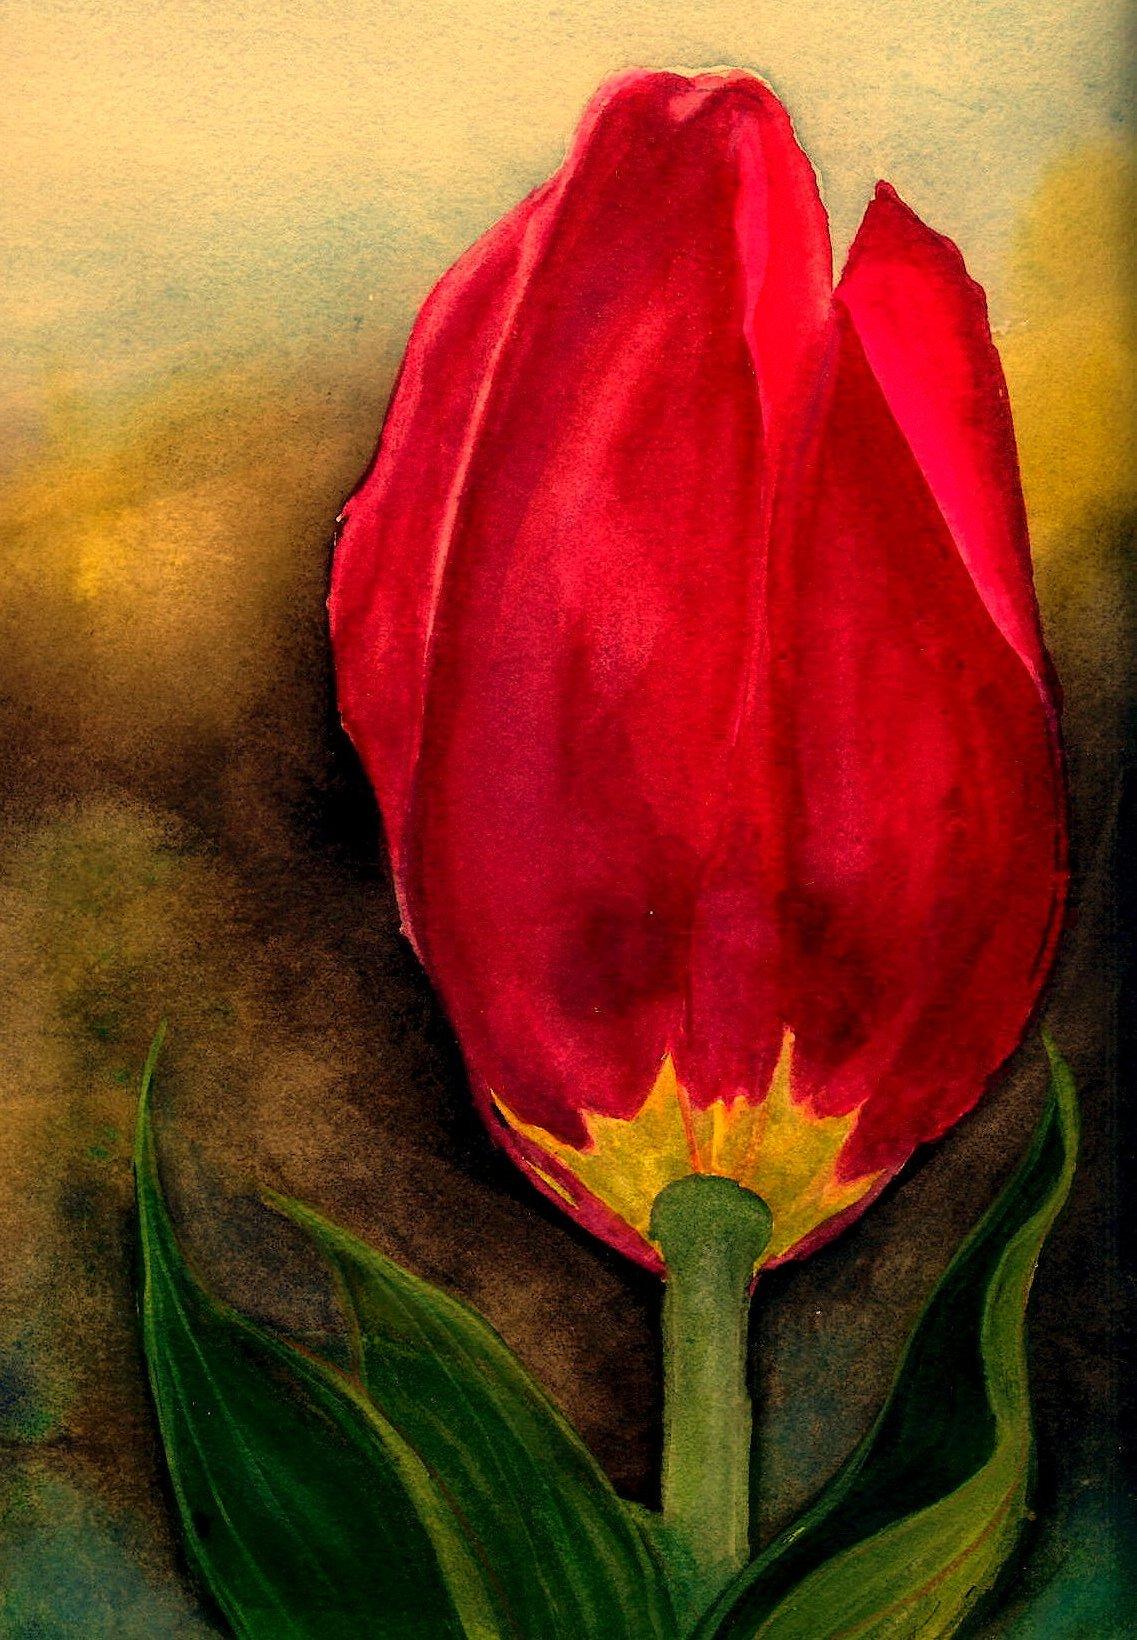 red tulip #1.jpg